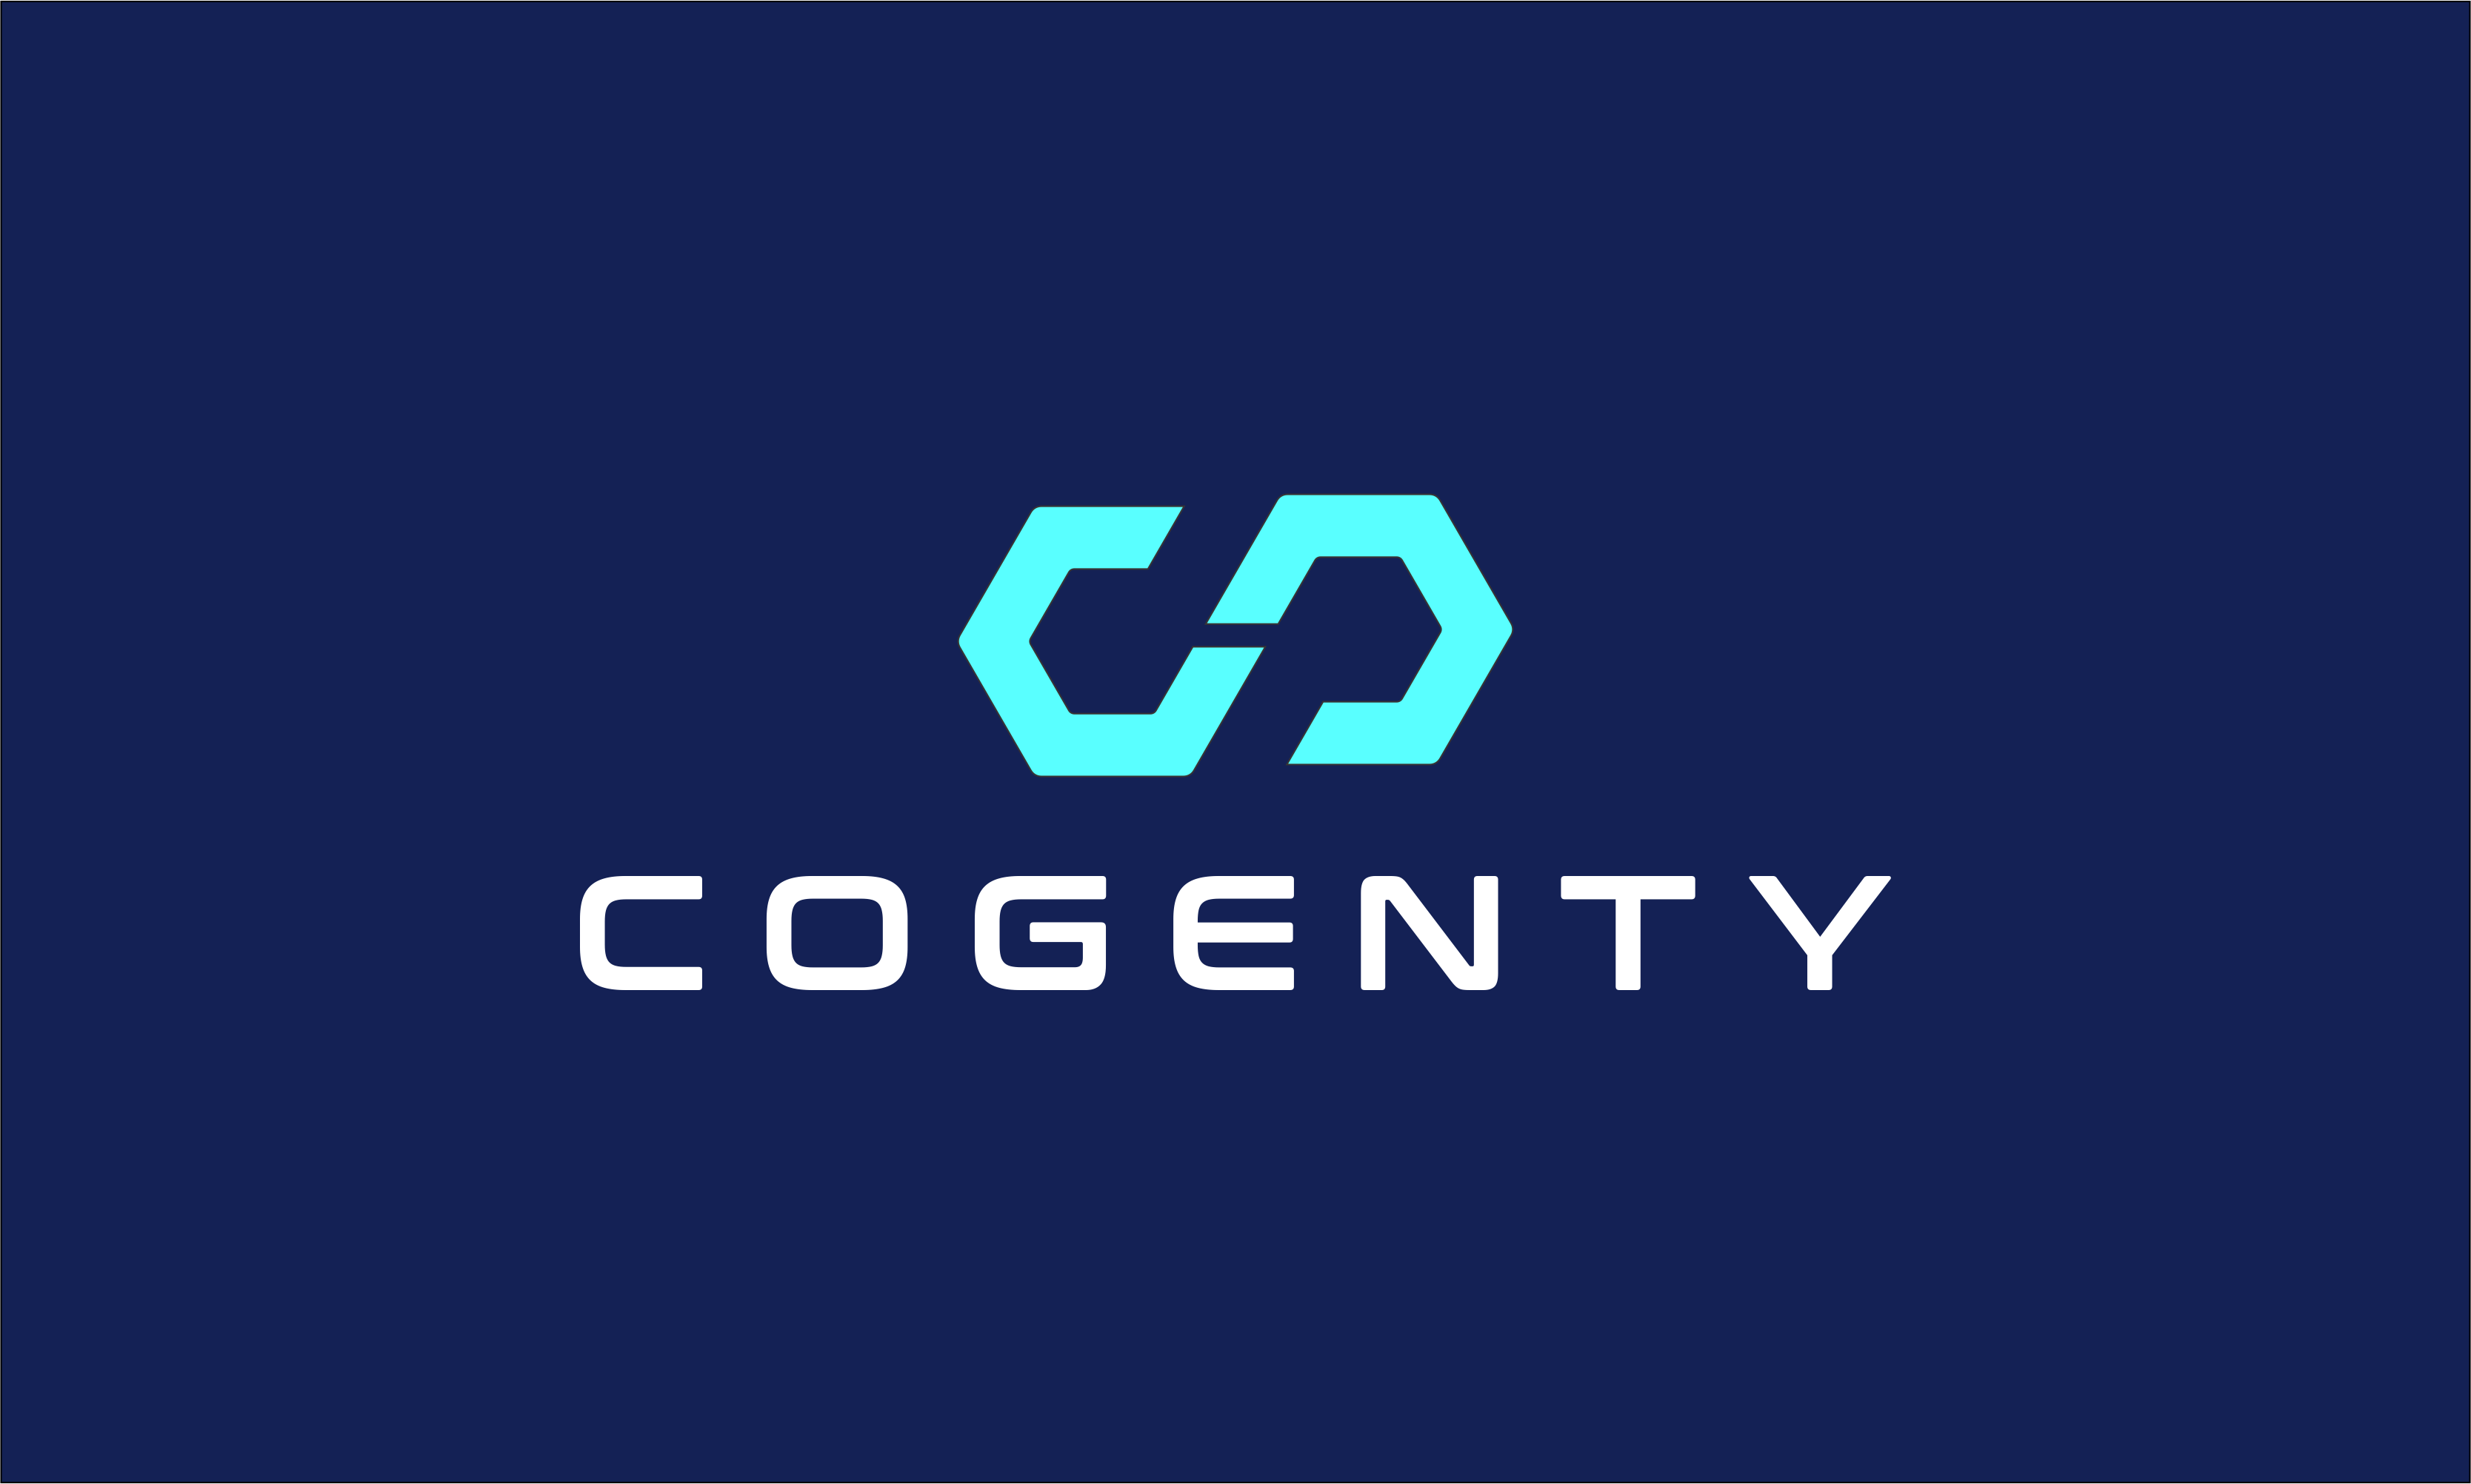 Cogenty